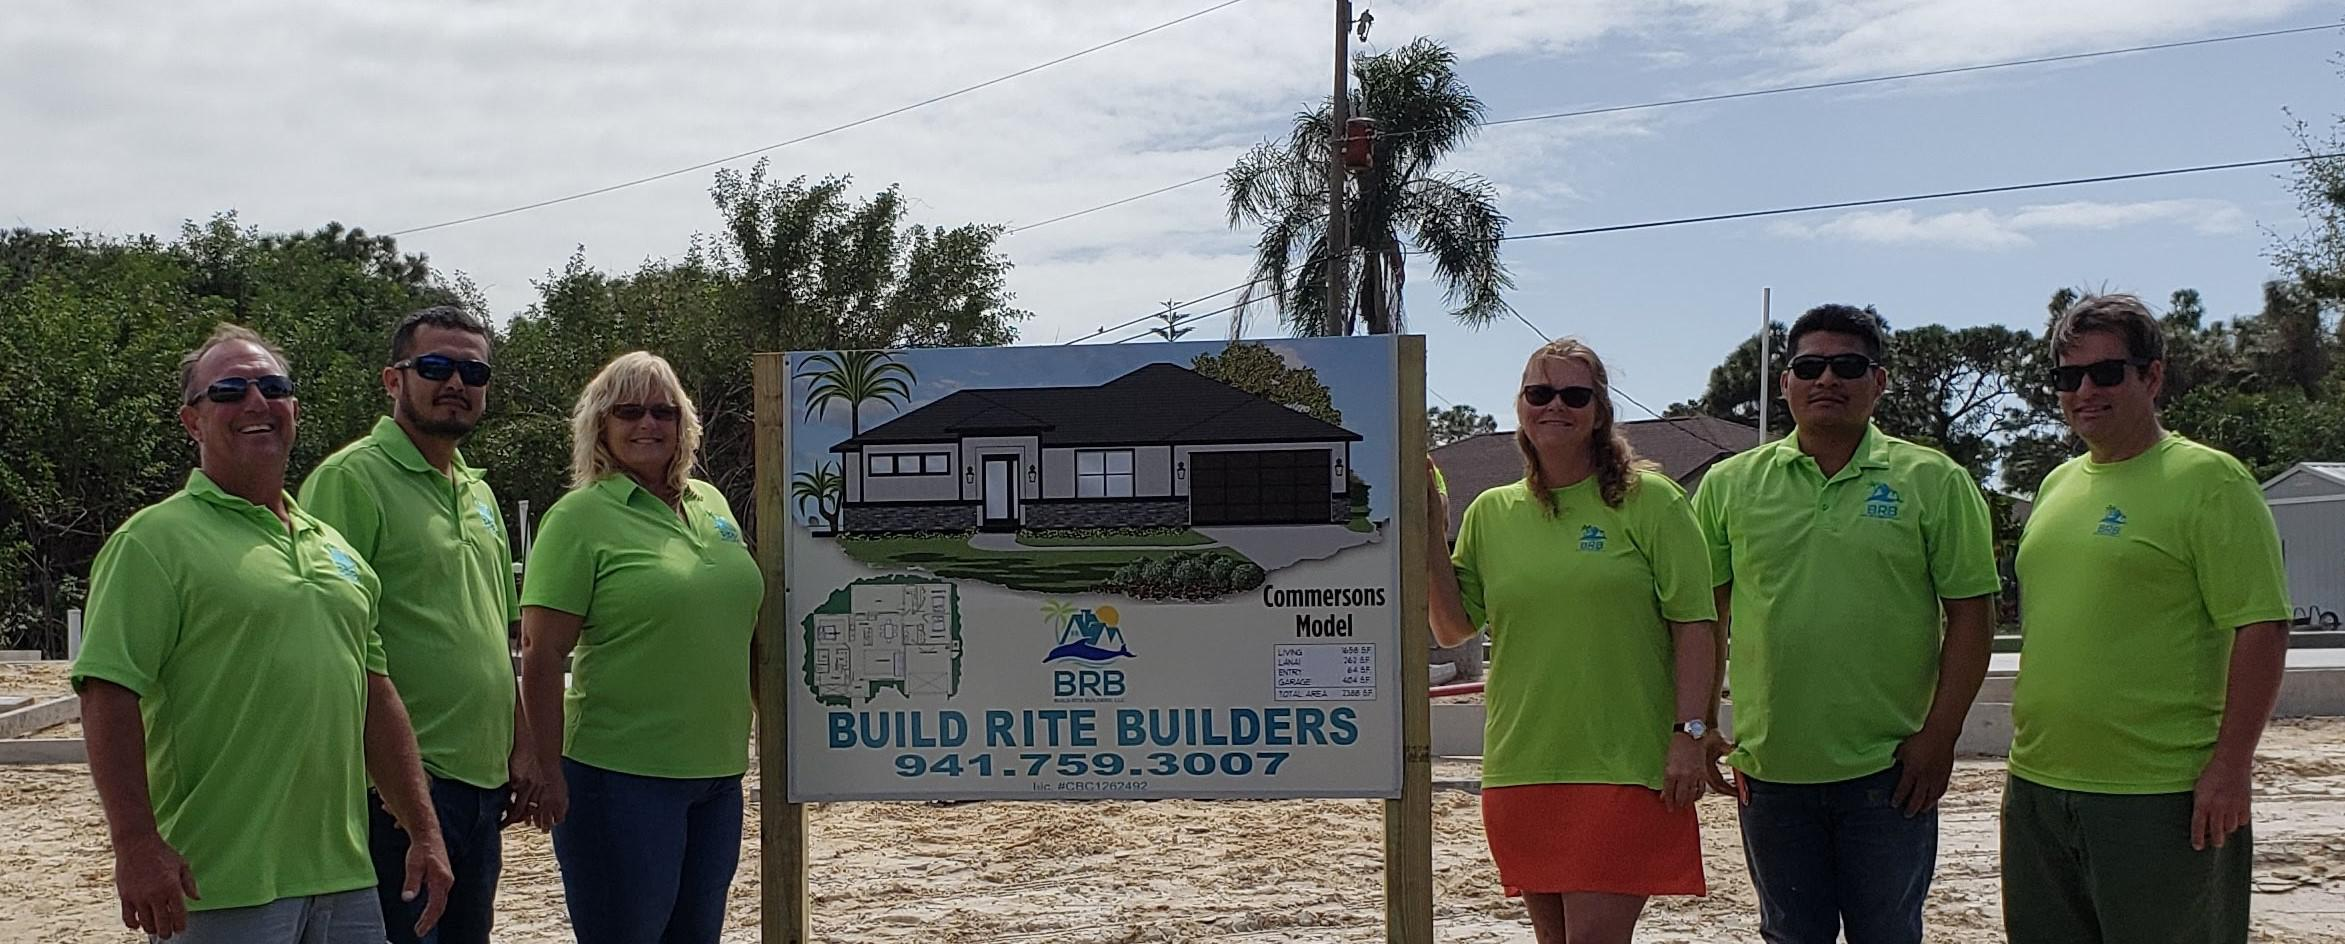 Build Rite Builders image 0